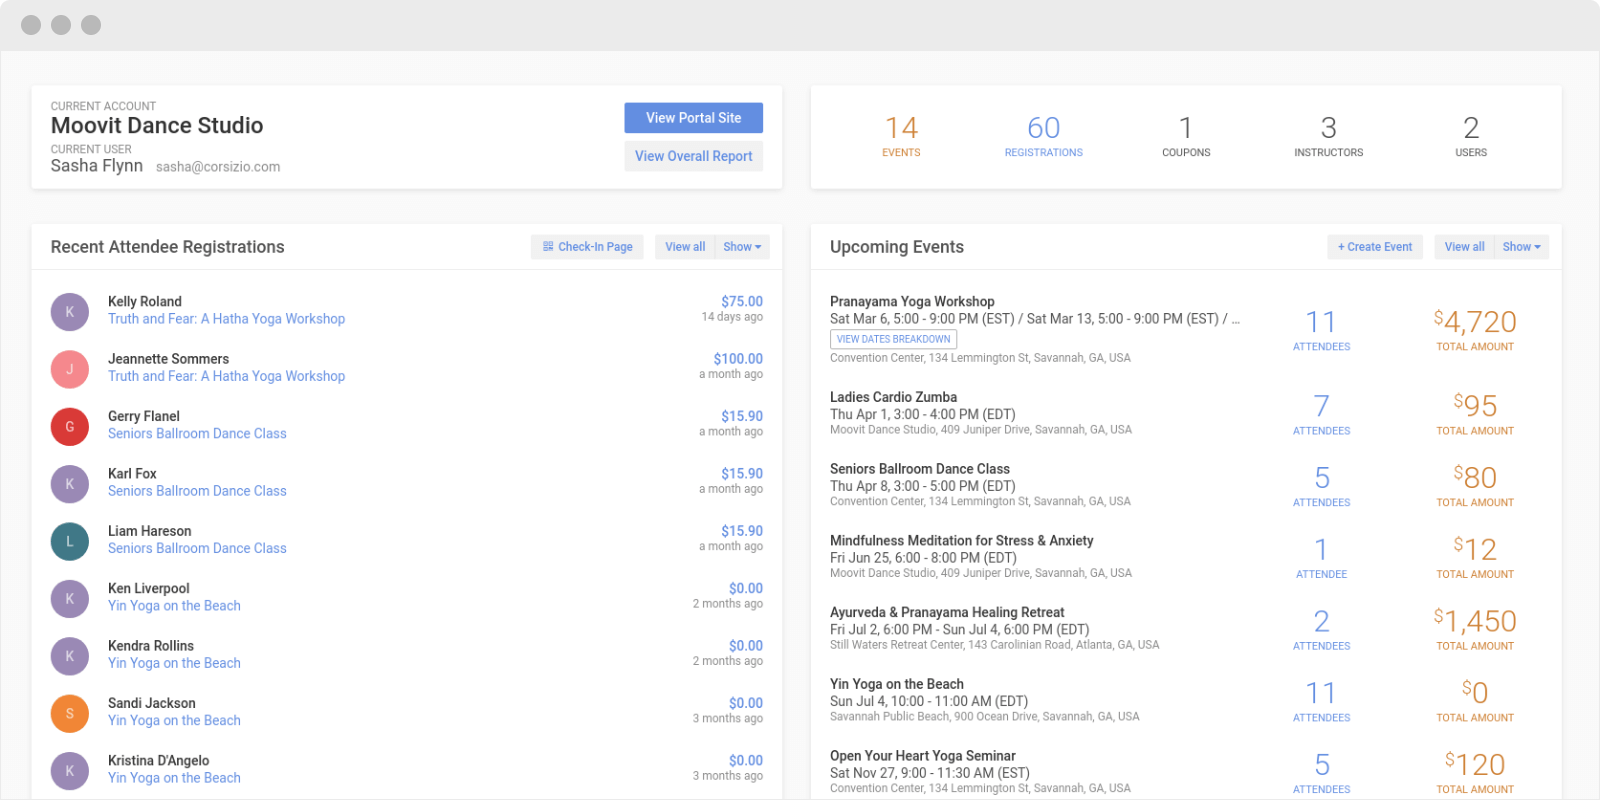 Corsizio screenshot 0